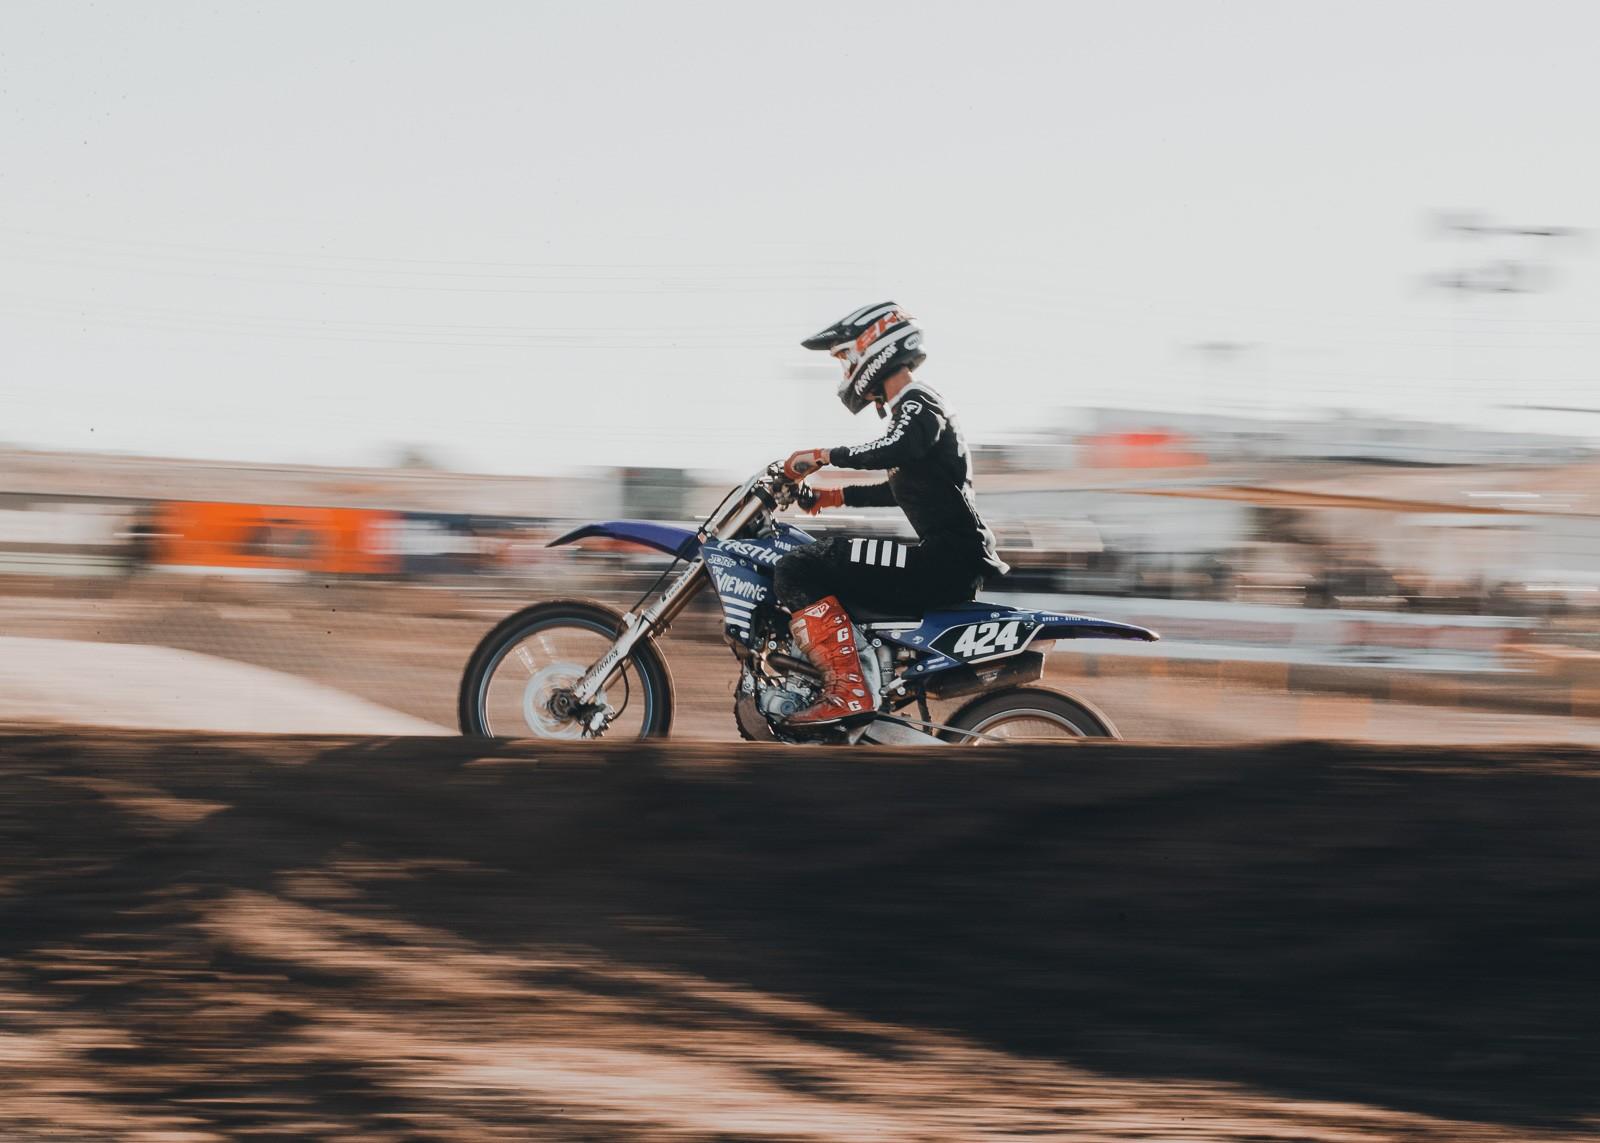 AZ Open of Motocross   Friday Racing Gallery - GuyB - Motocross Pictures - Vital MX